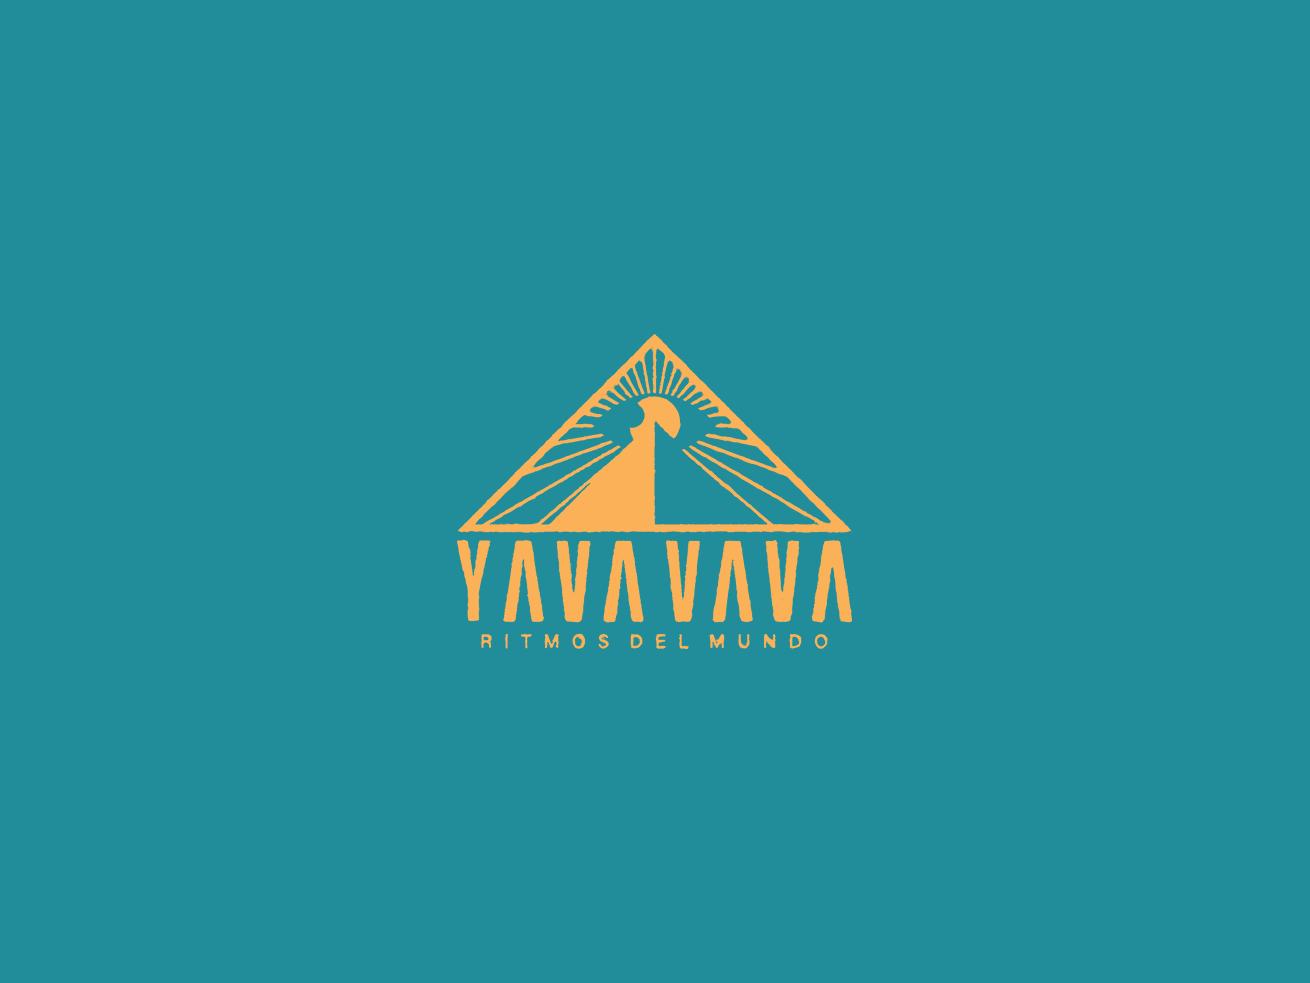 Yava Vava logo font logotype esoteric mystic pyramid eye sun vector branding design logo mexico guadalajara